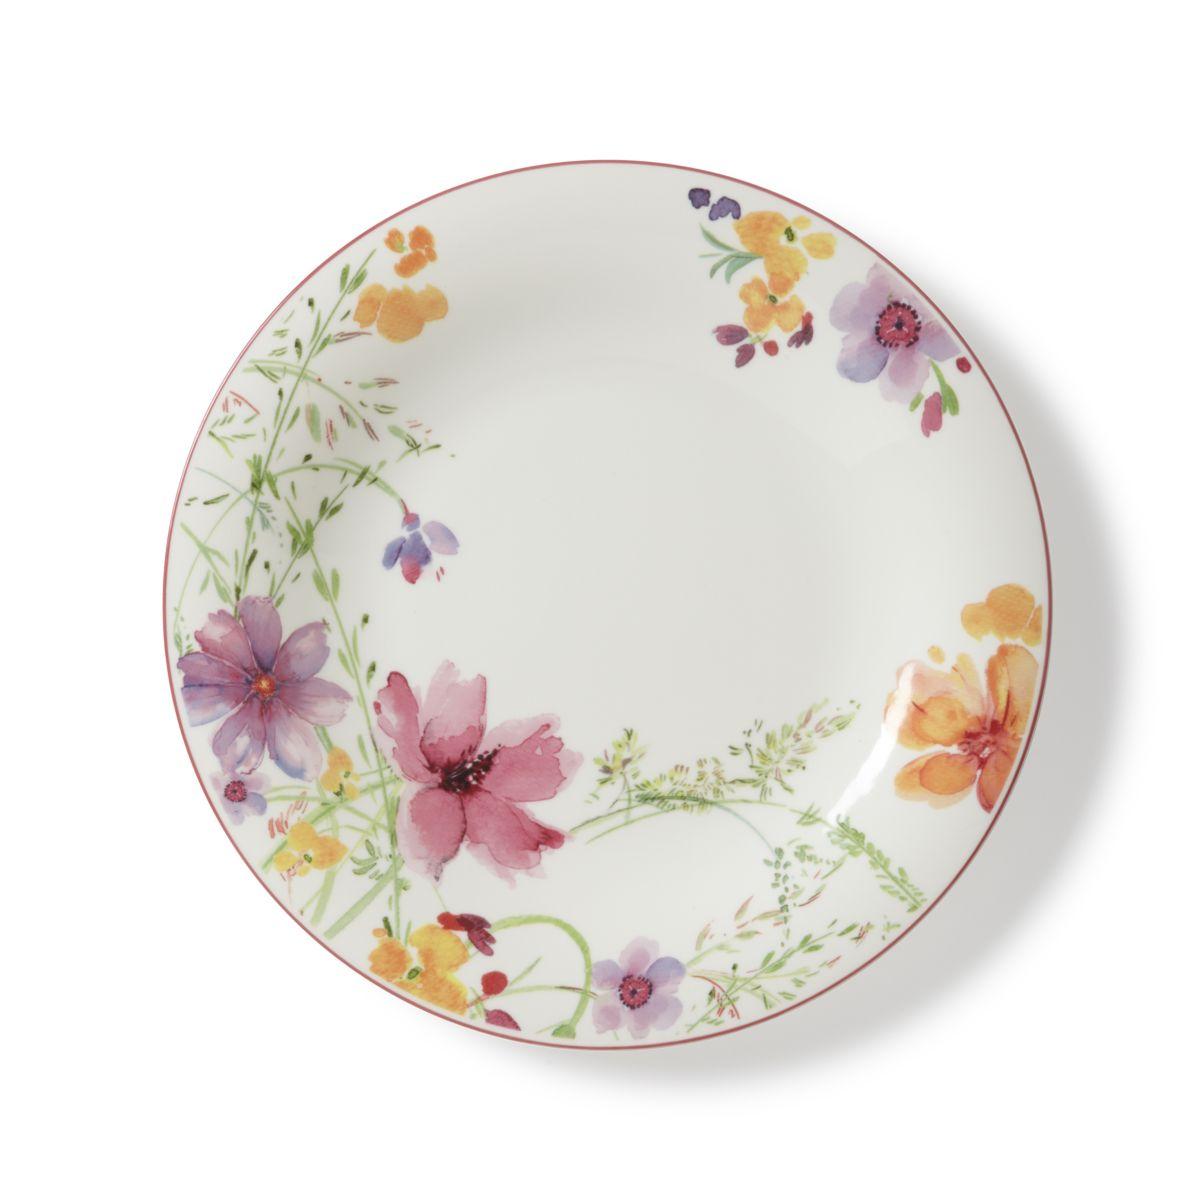 Villeroy Und Boch Mariefleur villeroy boch mariefleur dinner plate bloomingdale s